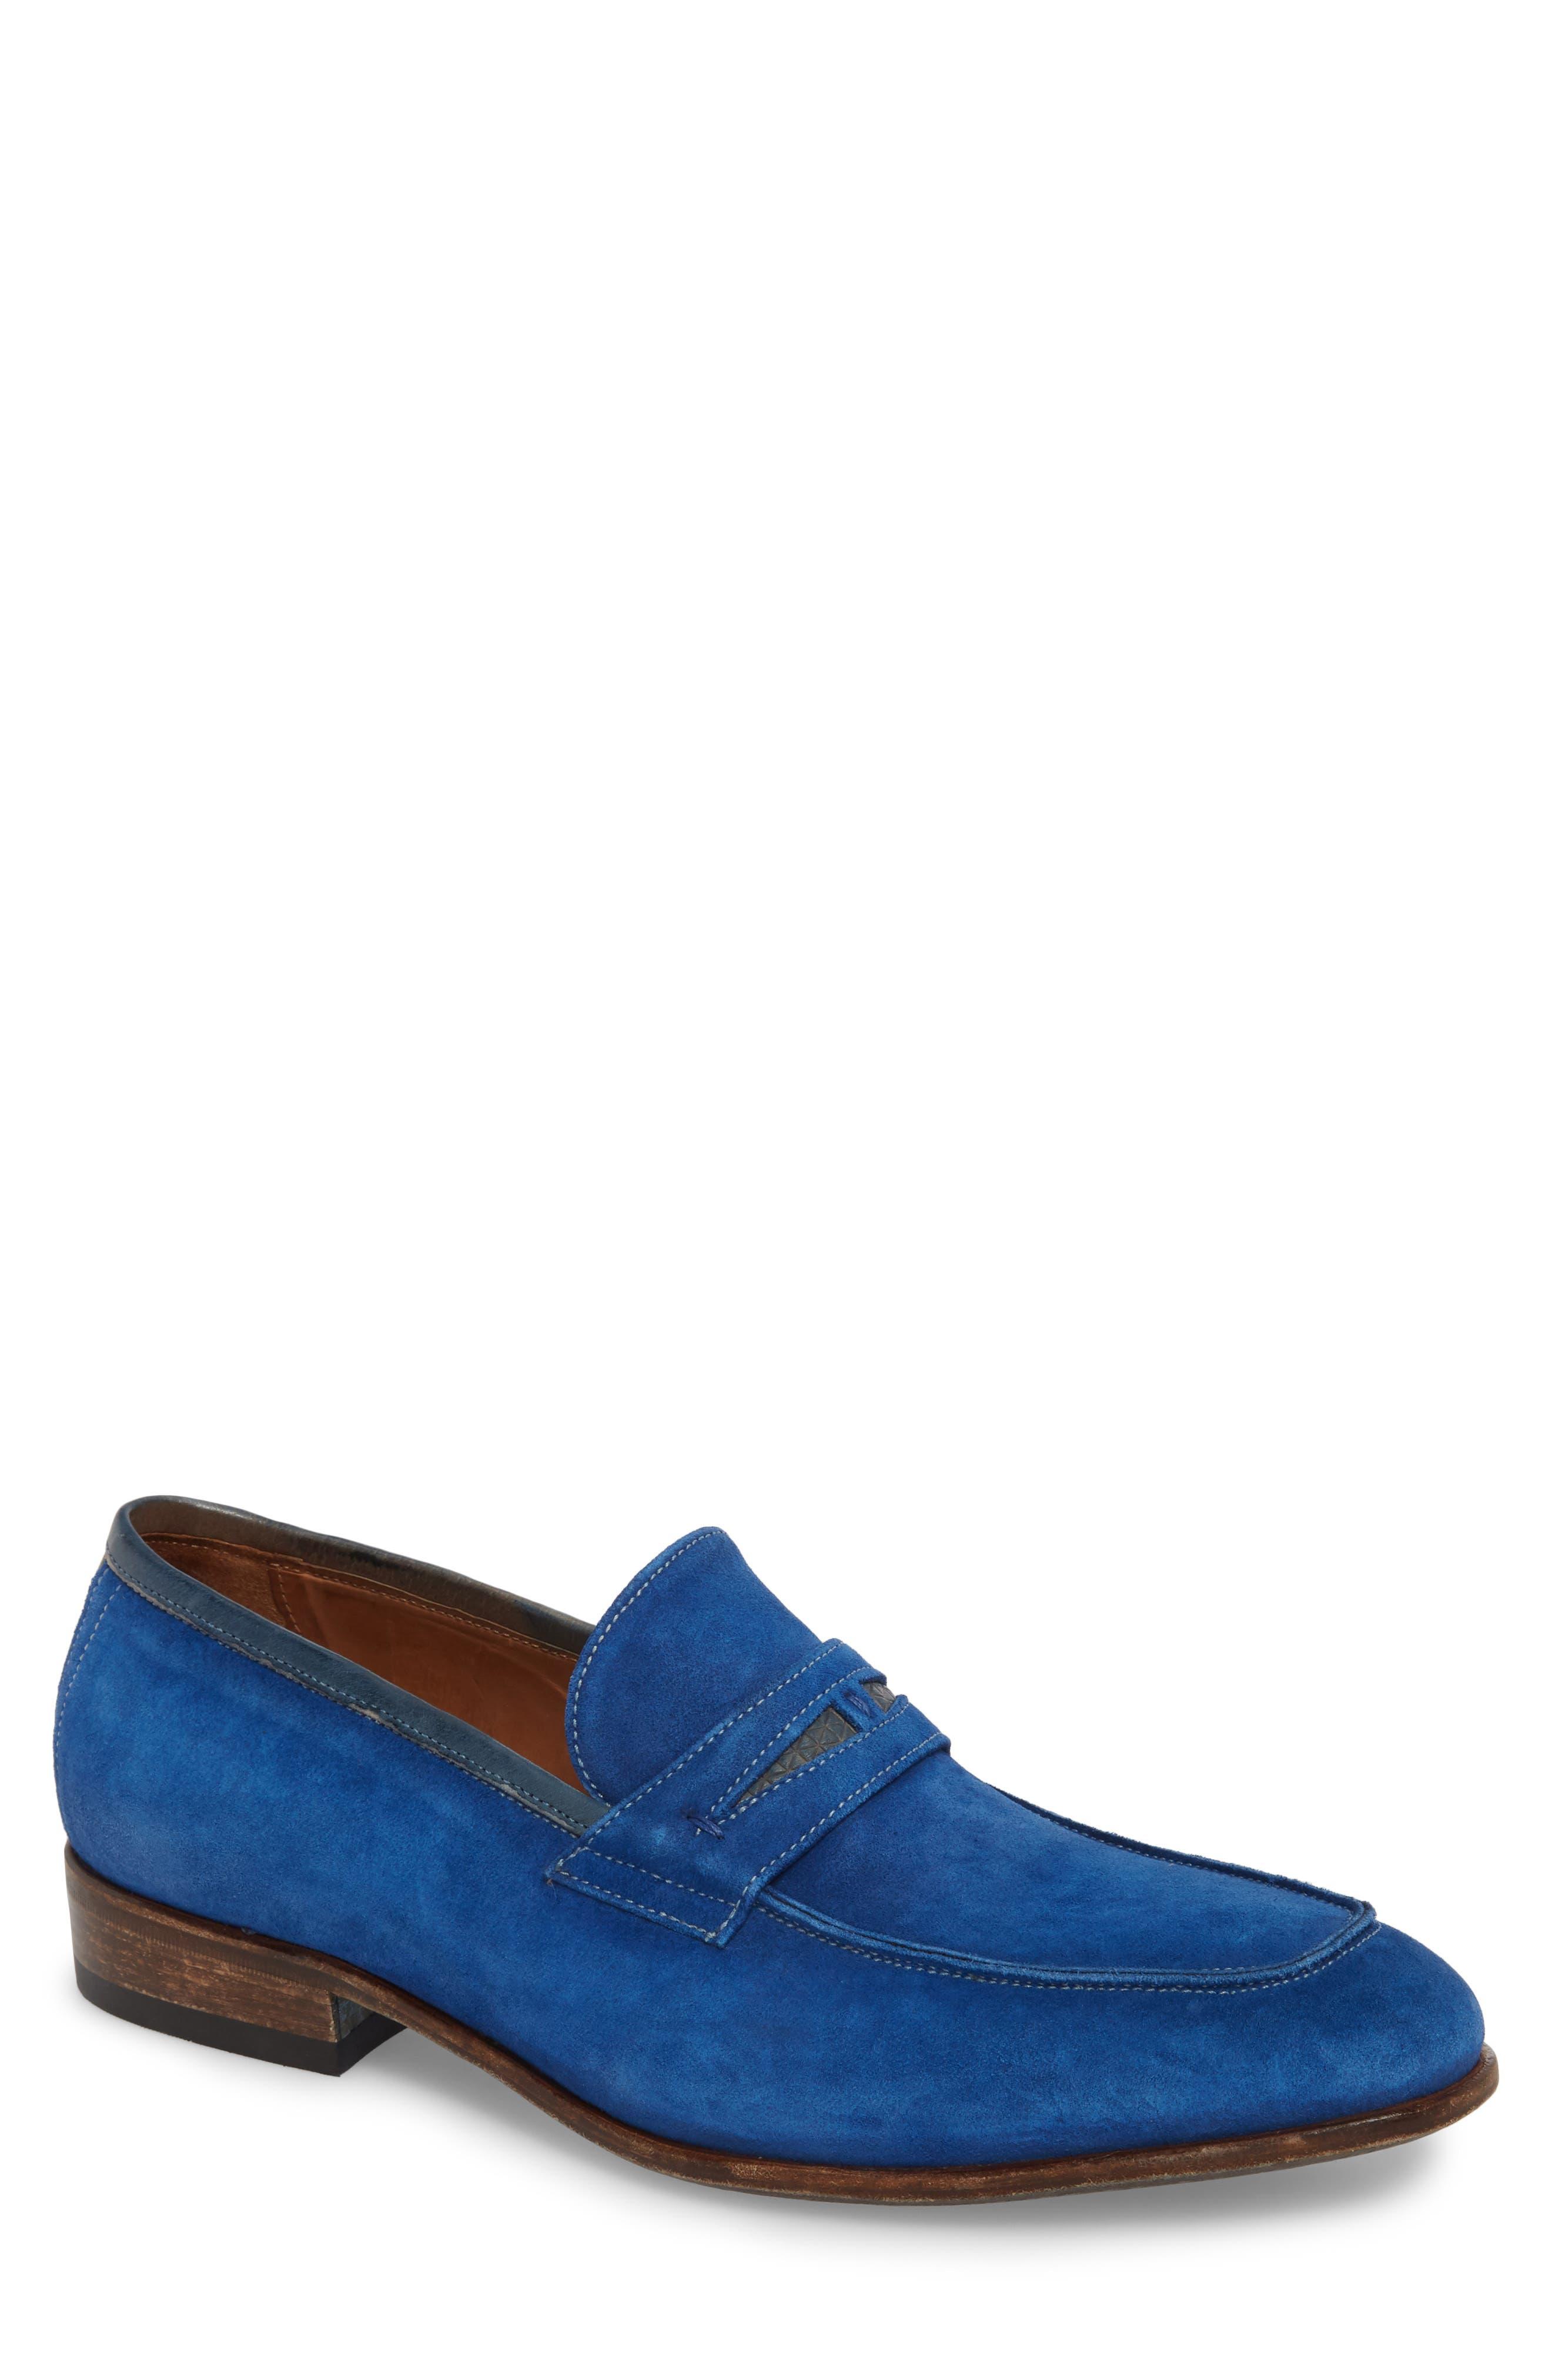 Lex Apron Toe Penny Loafer,                         Main,                         color, Blue Suede